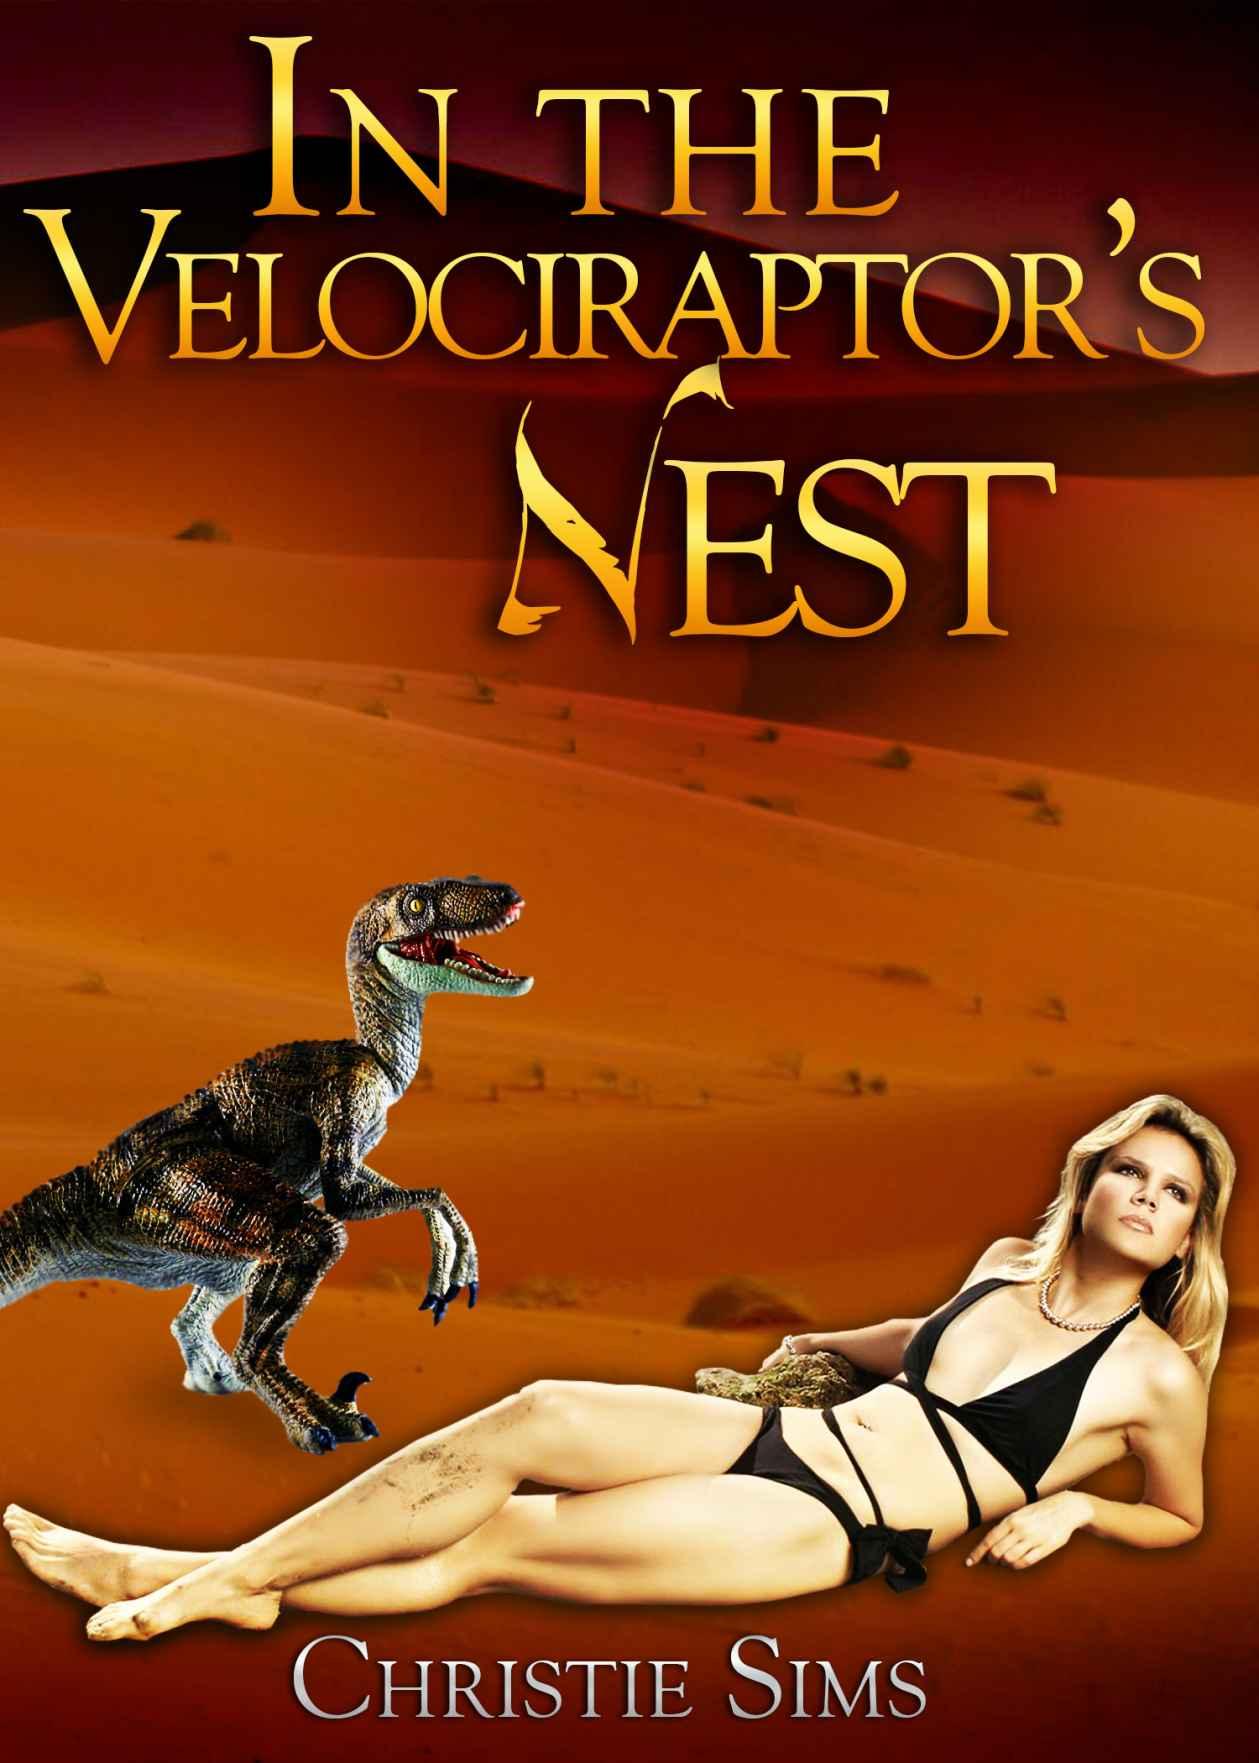 Velociraptor porn adult image